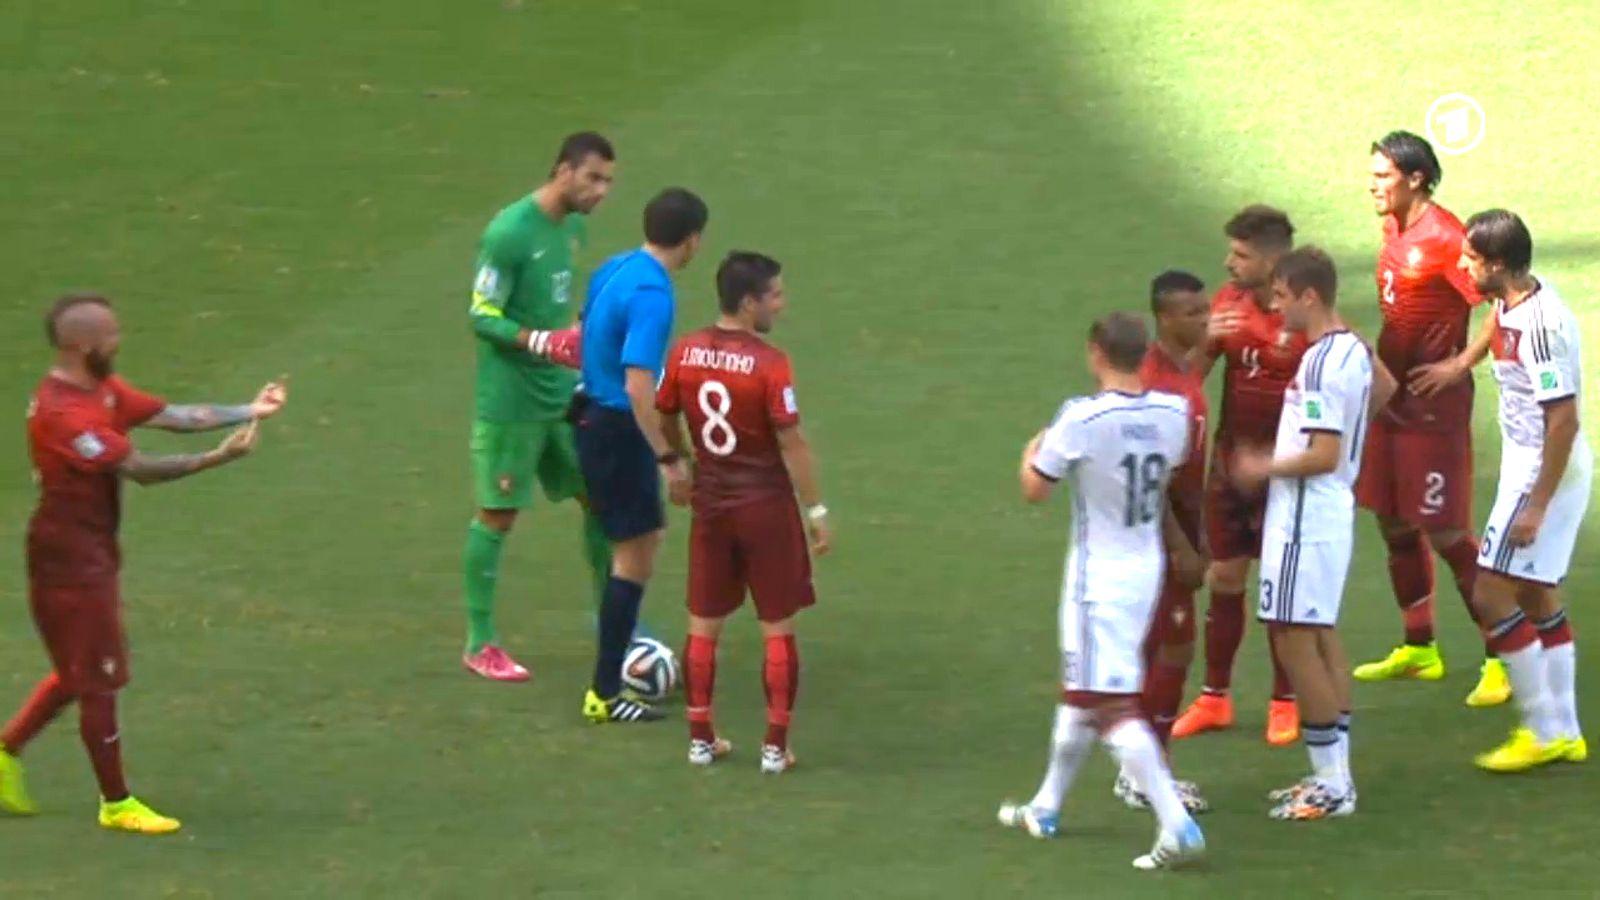 NUR ALS ZITAT Meireles/ Deutschland vs Portugal/ Zeigefinger